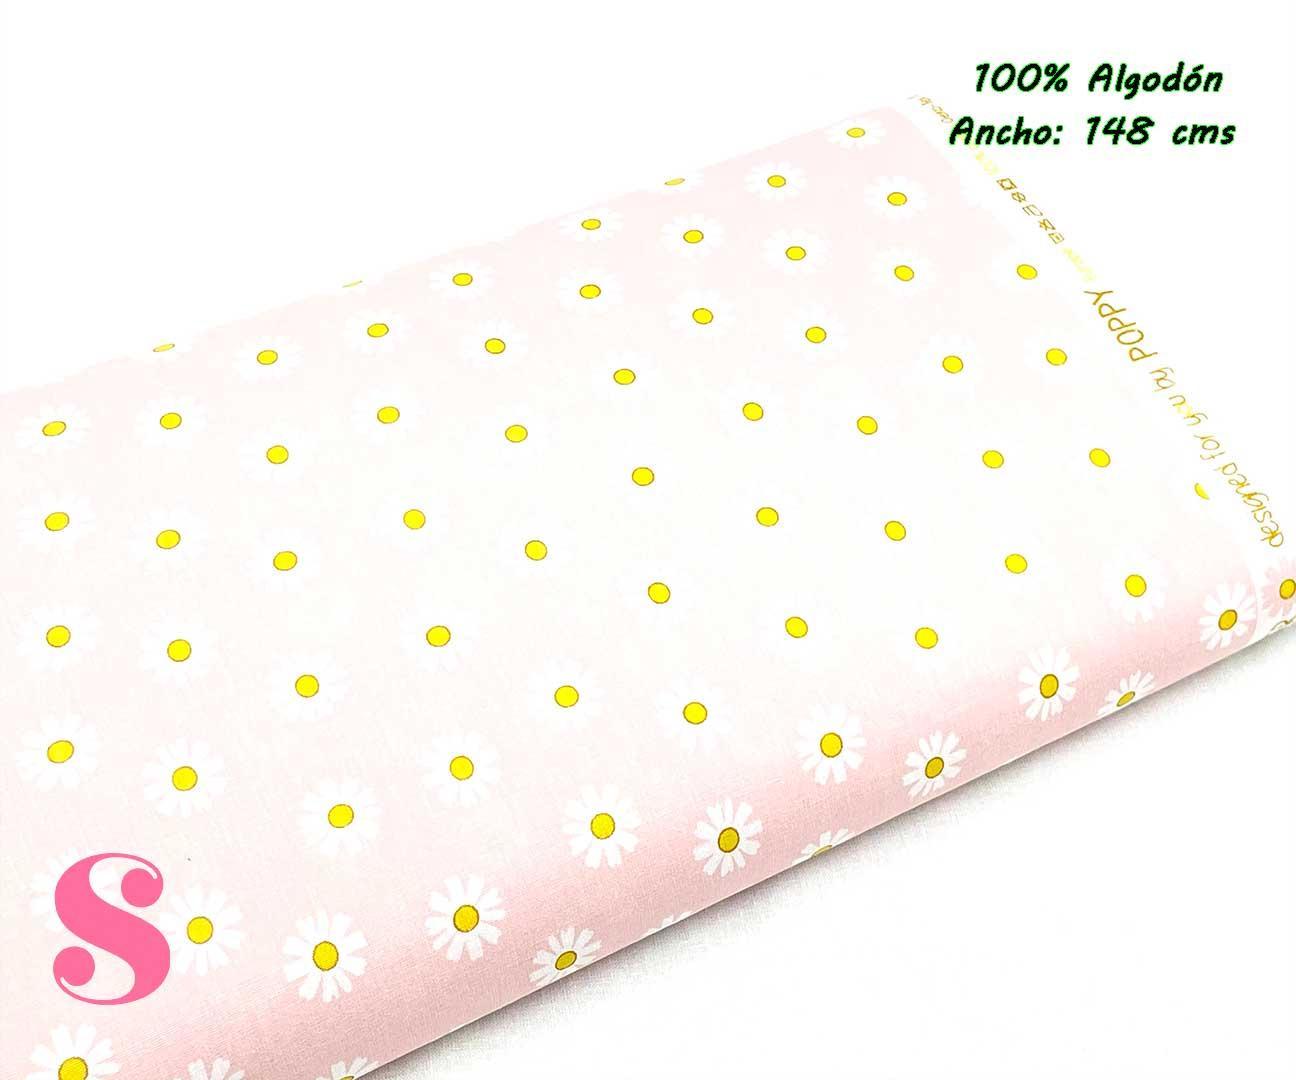 66-tela-estampada-flores,telas-dibujos-primaverales,telas-infantiles,tejidos-infantiles,Tejido Estampado Margaritas fondo Rosa